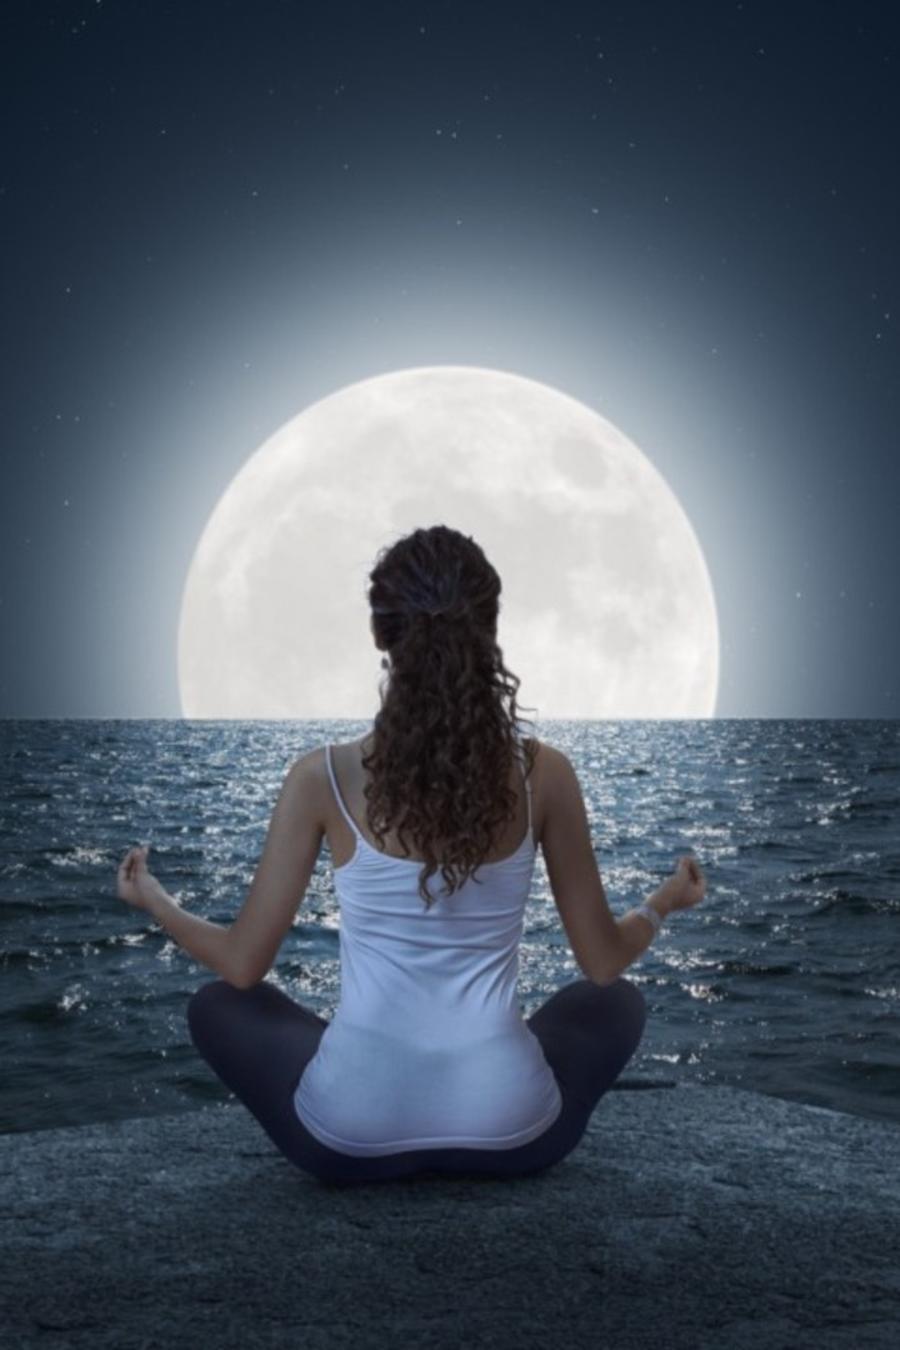 Mujer mirando la luna